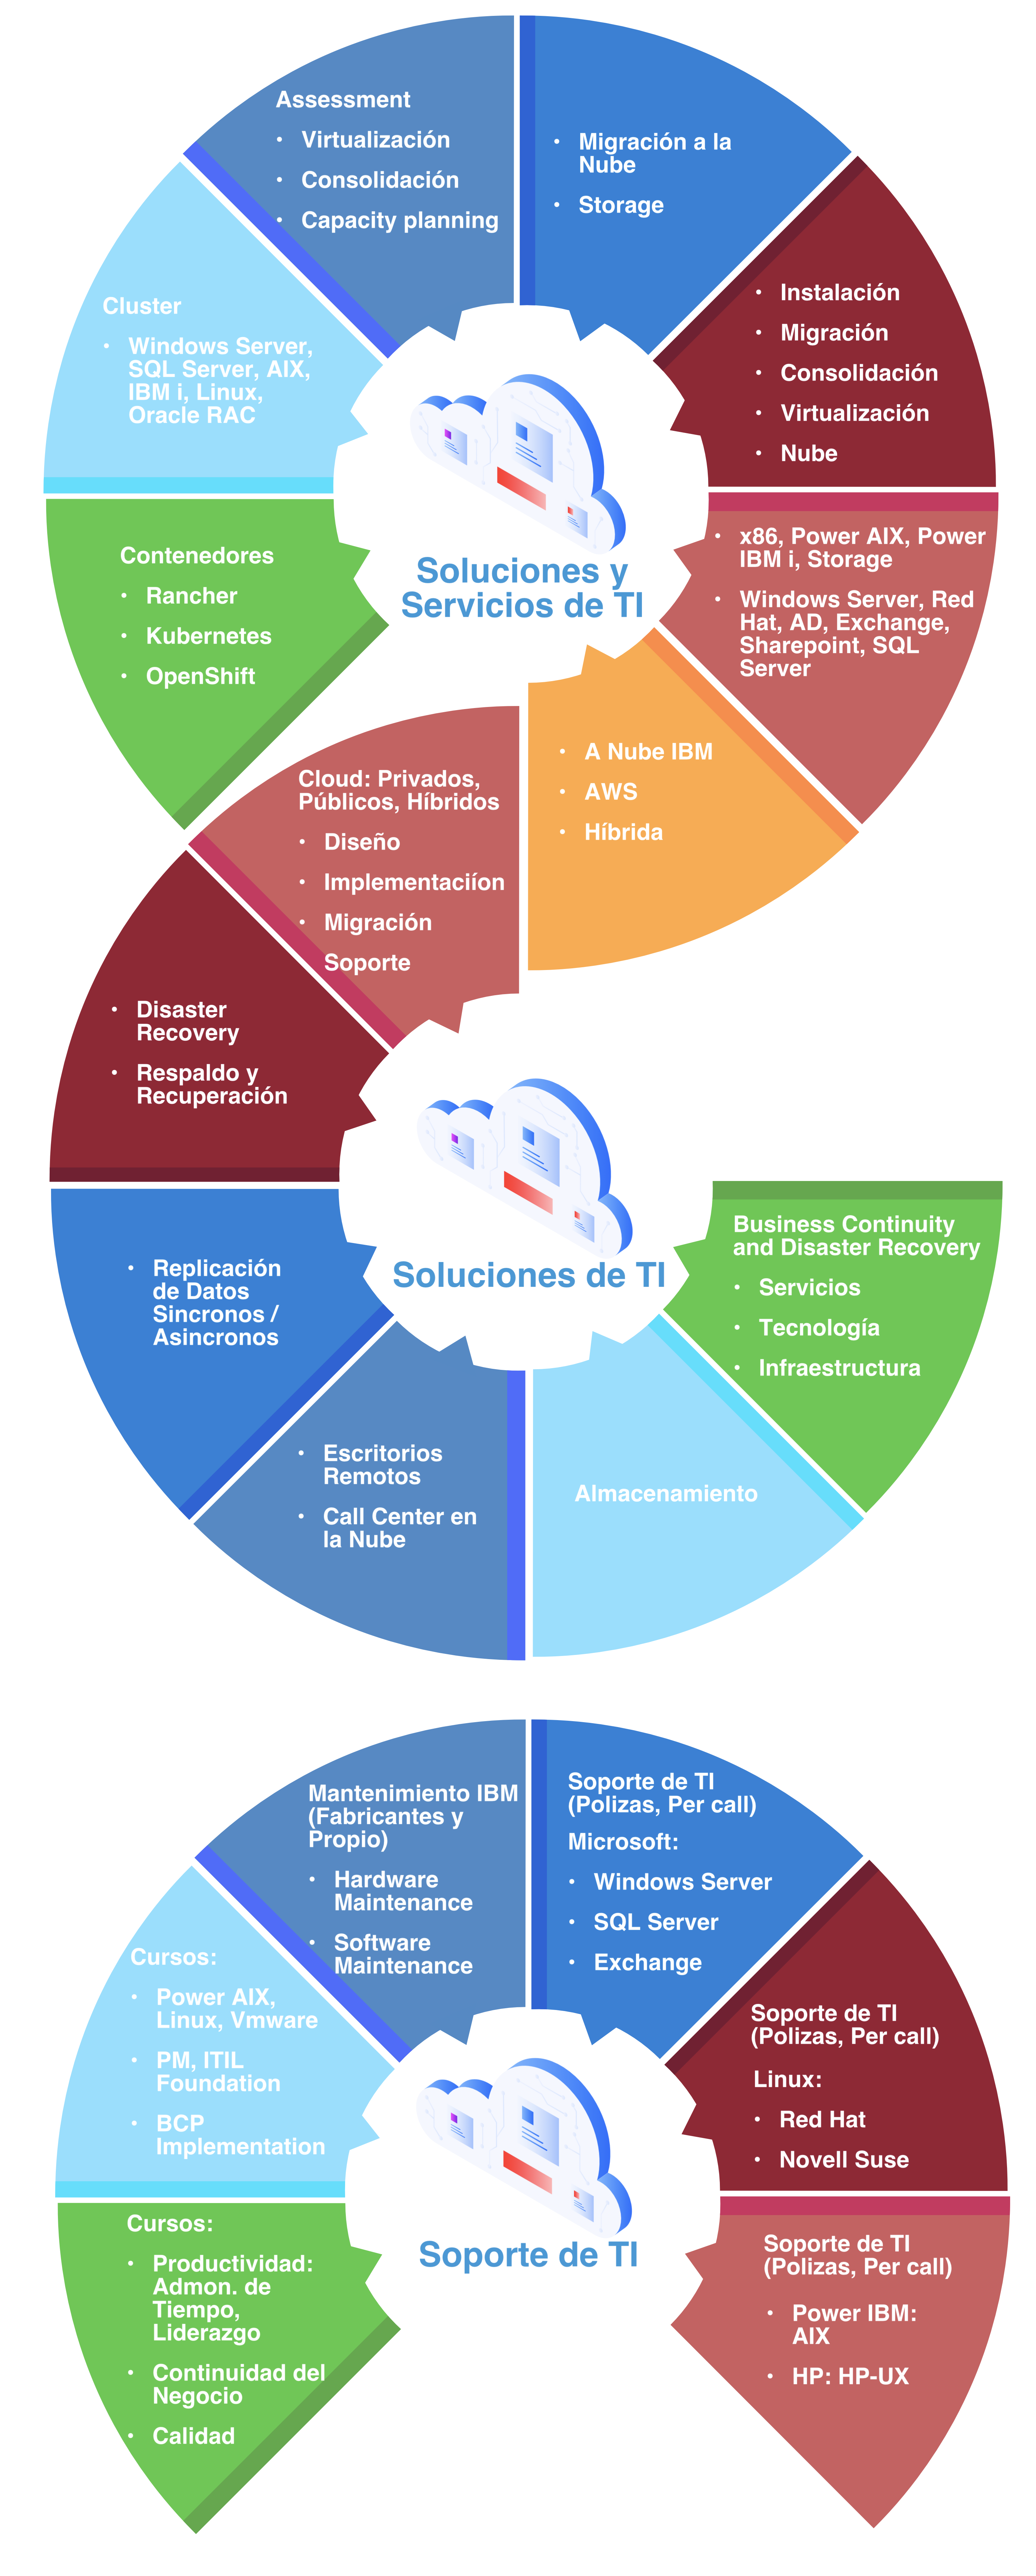 Soluciones de Ti, Cloud, Servicios, Soporte de TI, TI, Nube